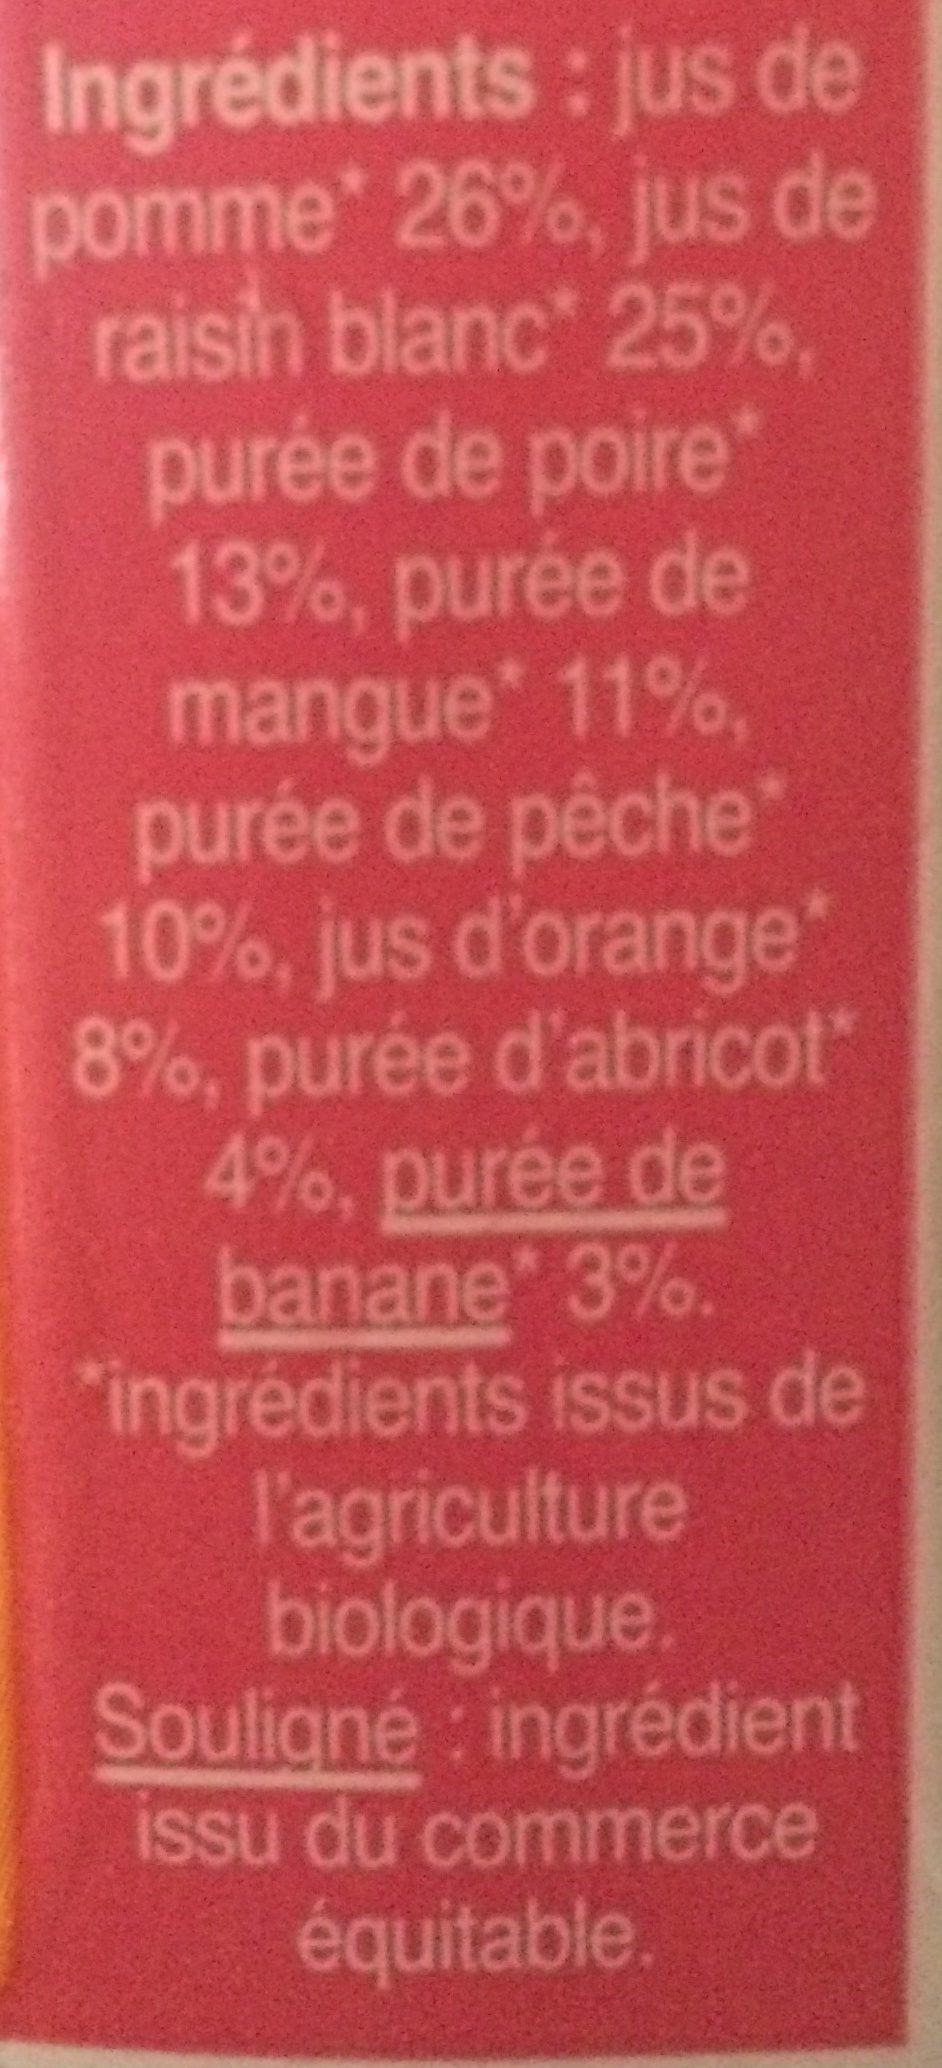 Pur jus multifruits equitable biocoop 6x20cl - Ingrediënten - fr